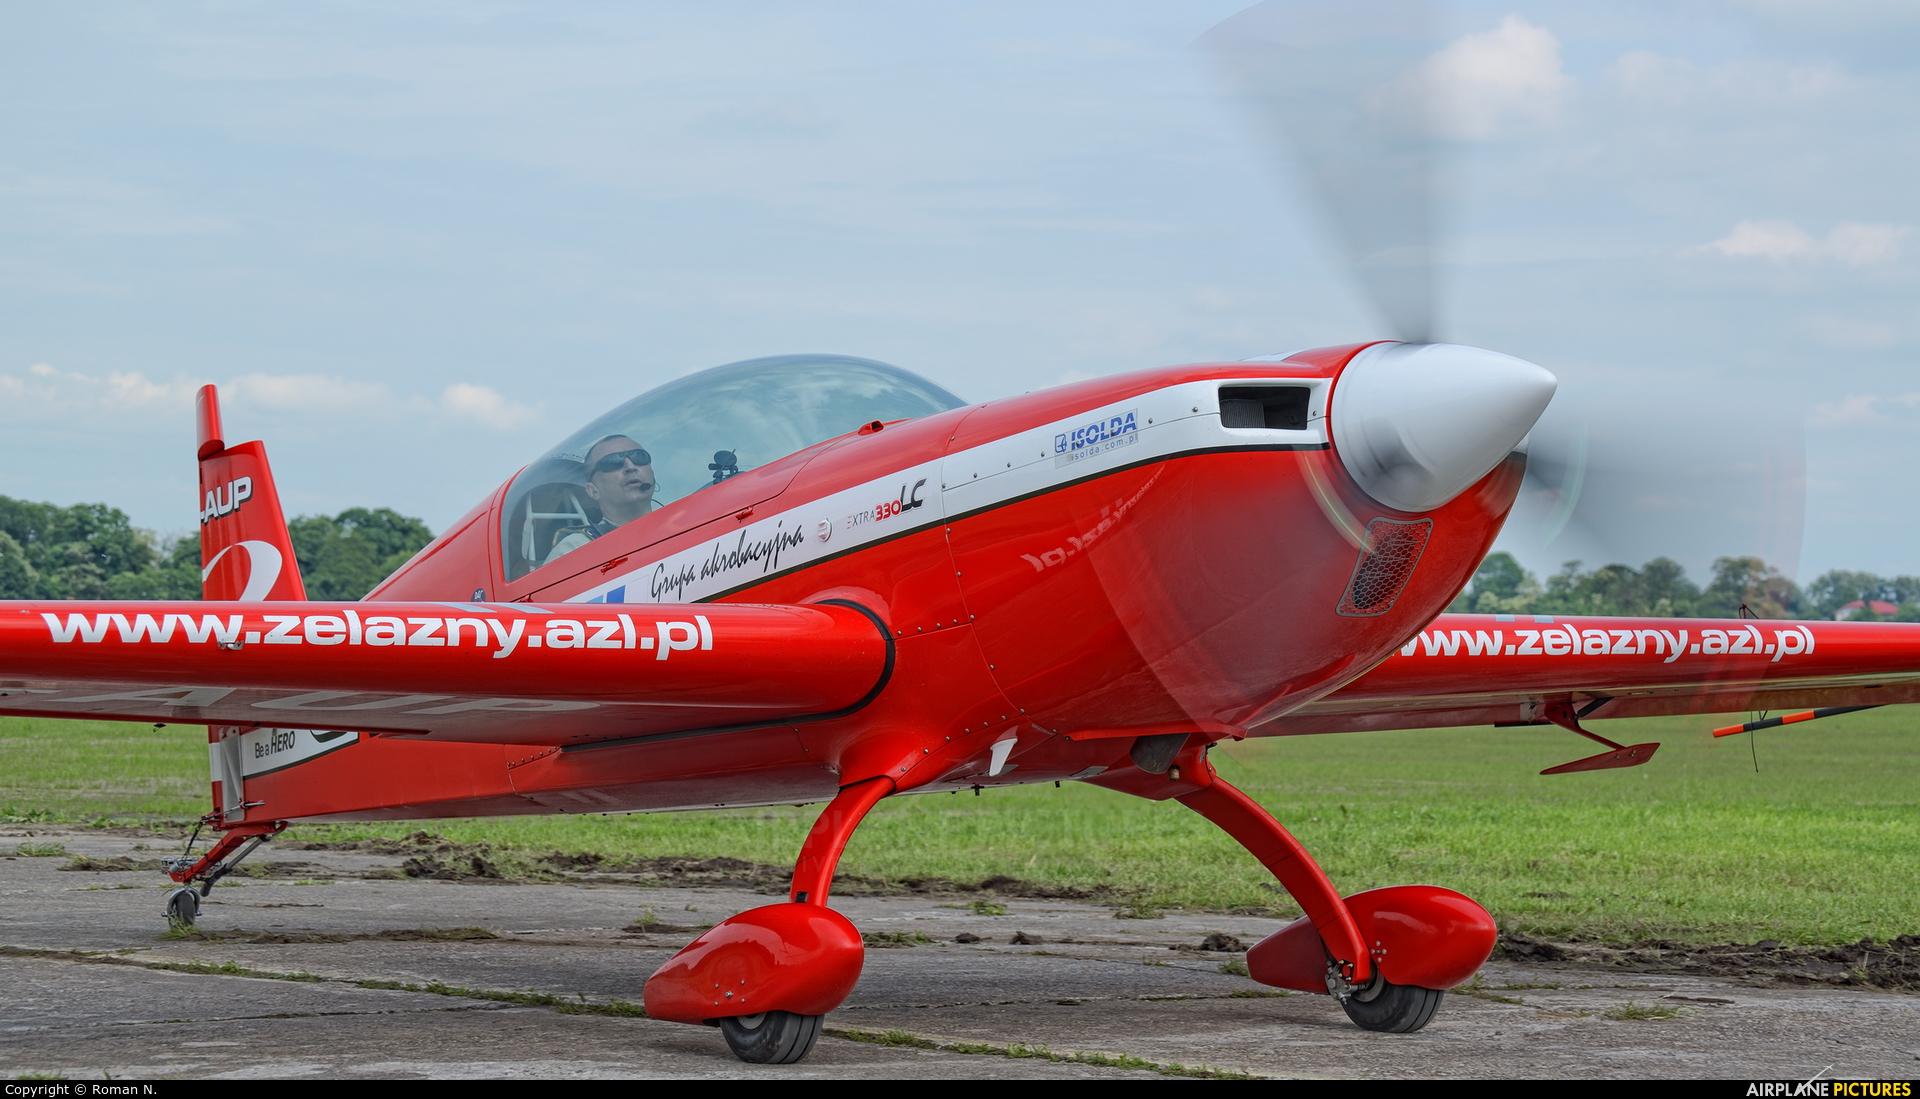 Grupa Akrobacyjna Żelazny - Acrobatic Group SP-AUP aircraft at Płock